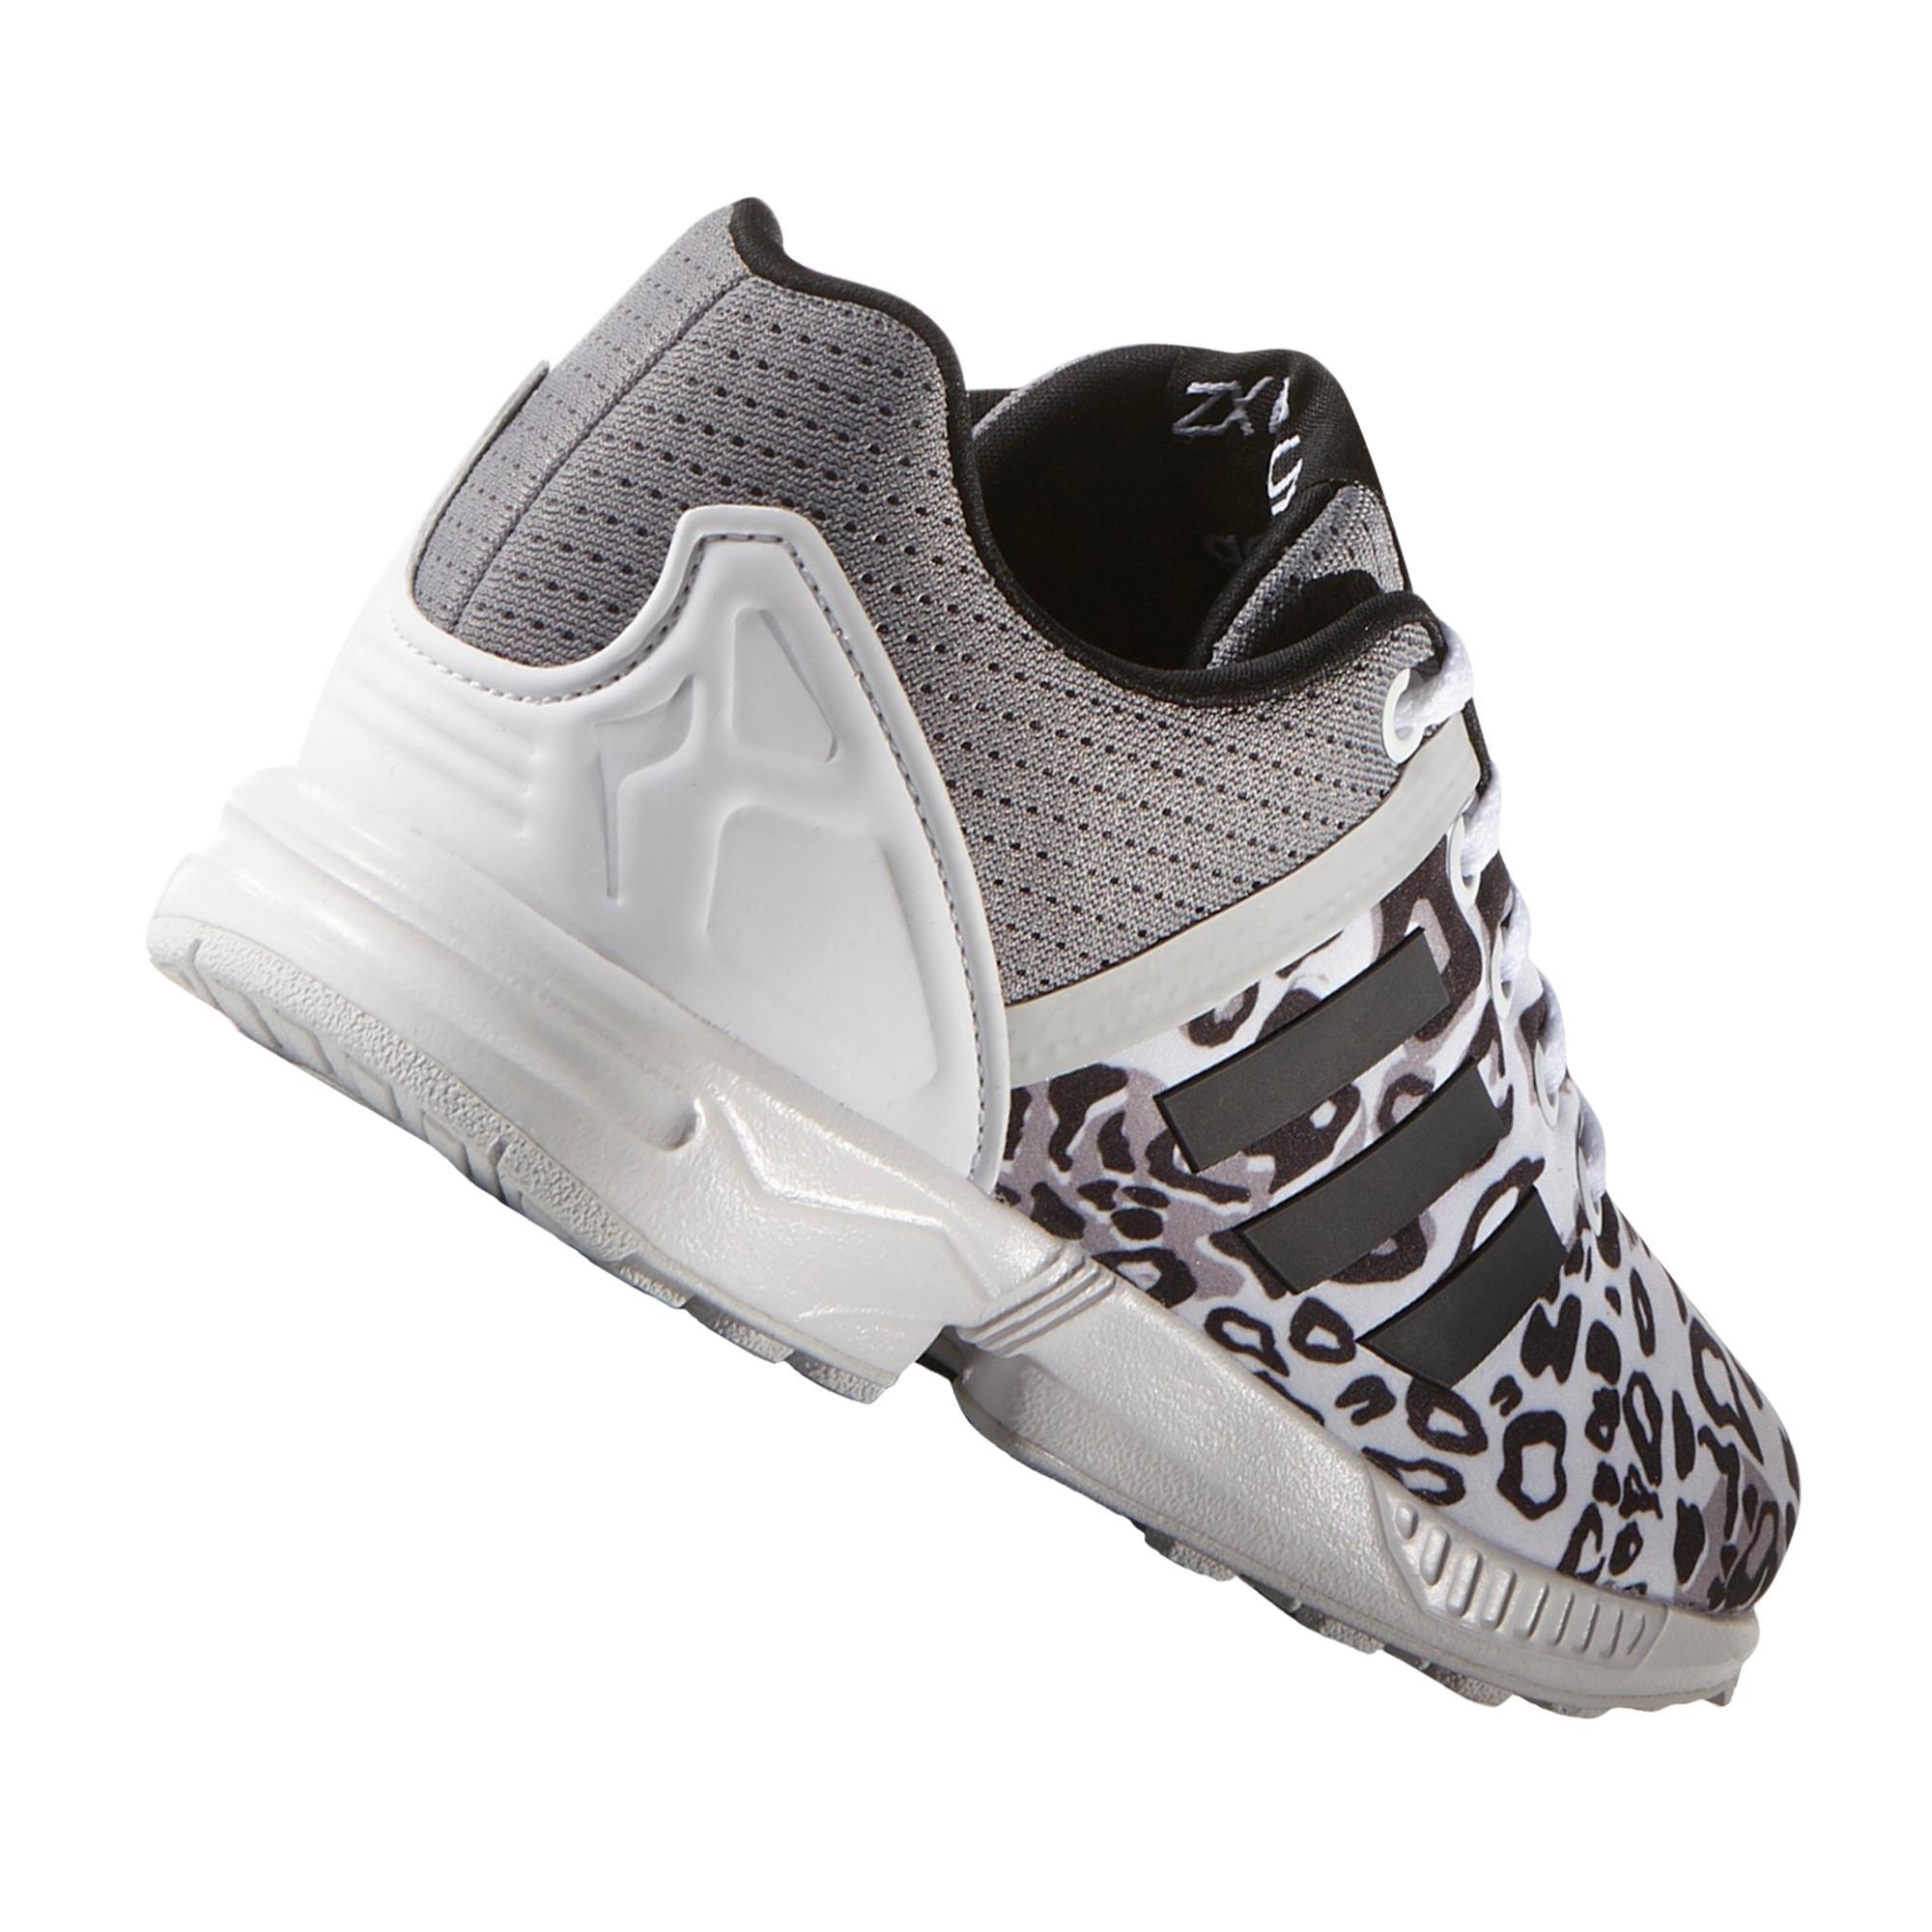 plus récent 0aa8f 46ff5 adidas Zx Flux Split Leopard (Gs) Spor Ayakkabı